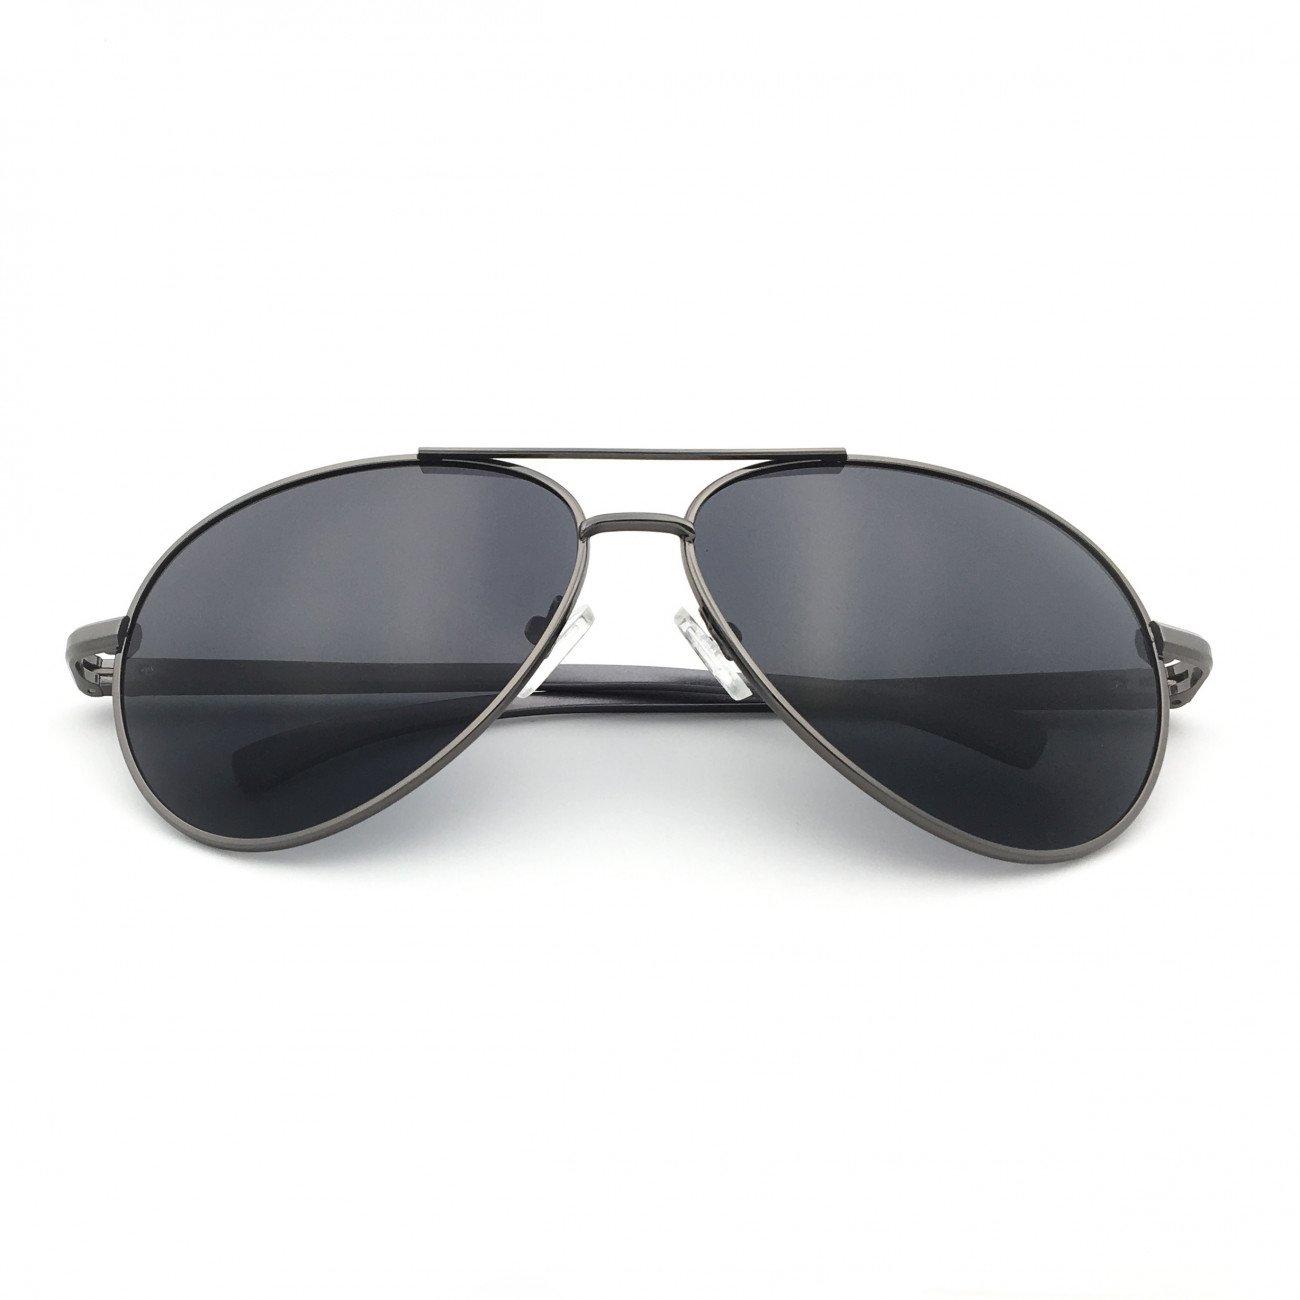 919201a144 J+S Ultra Sleek Sports Aviator Sunglasses